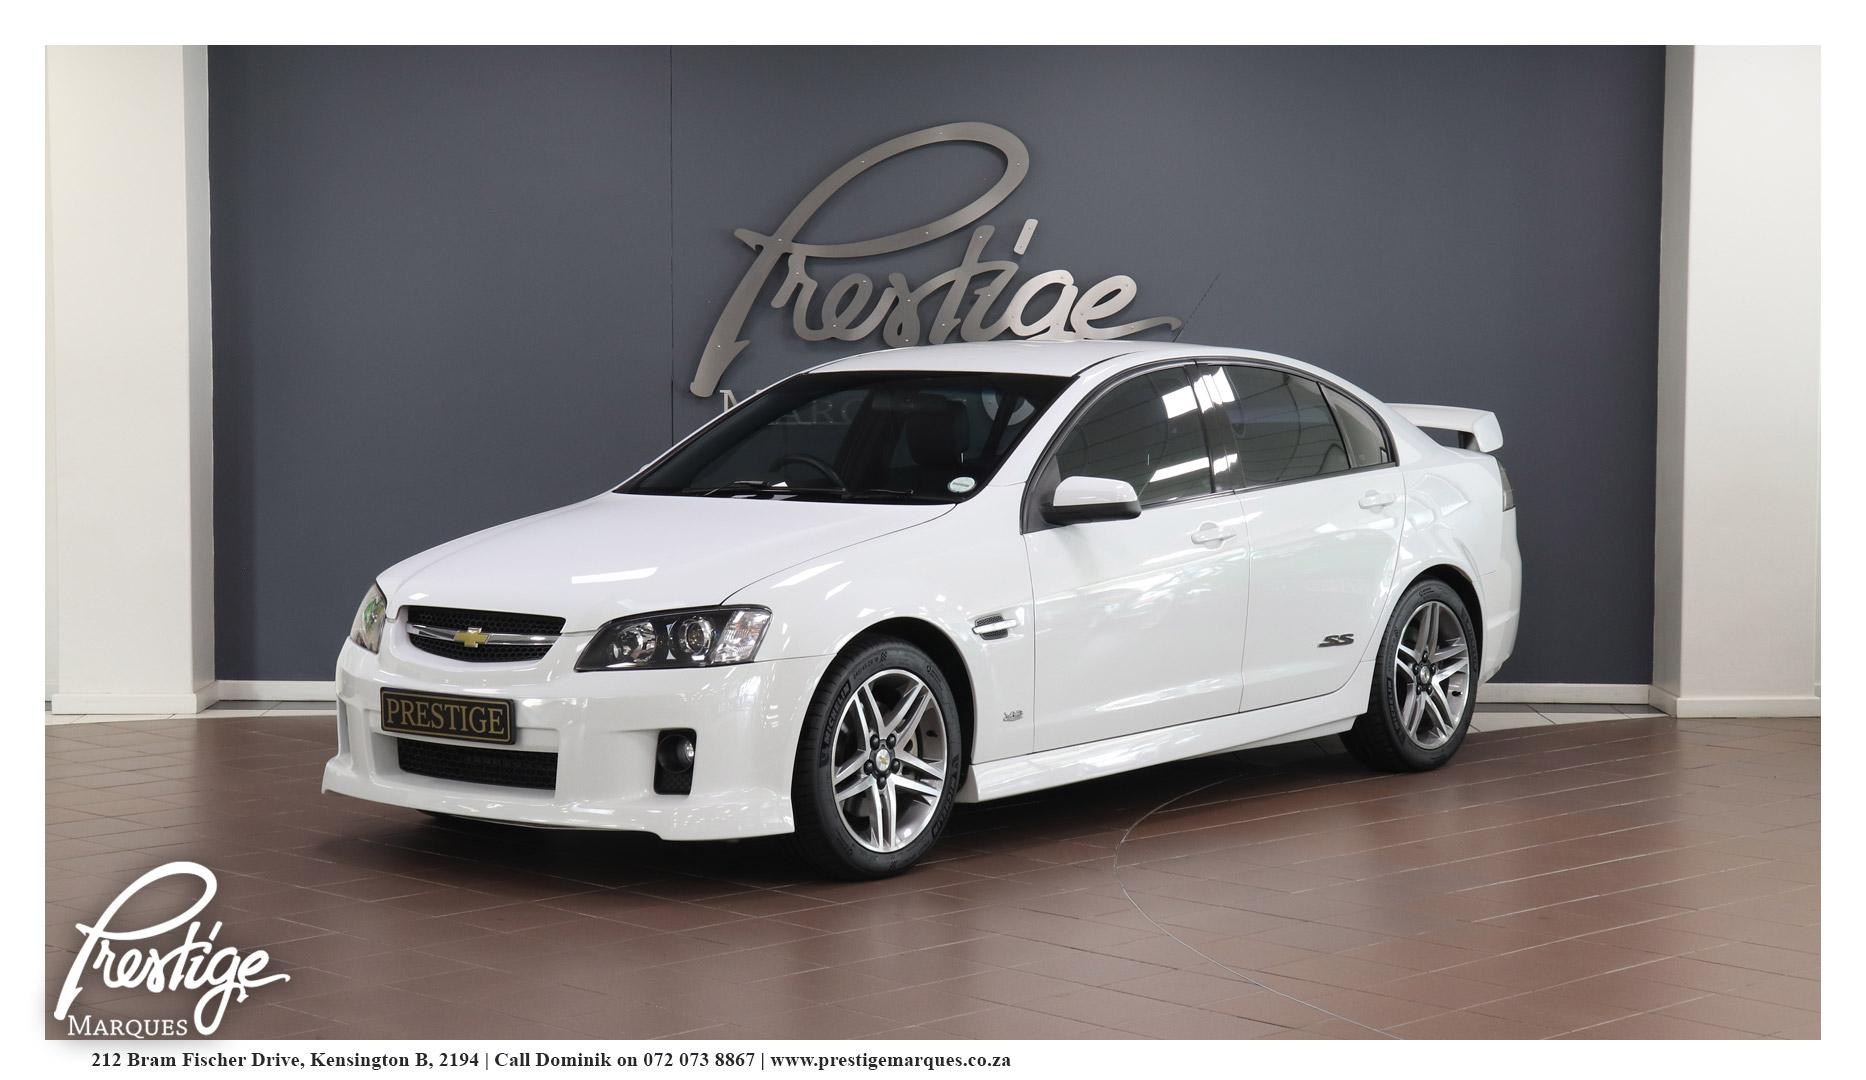 2008-Chevrolet-Lumina-SS-5.4-Manual-Prestige-Marques-Randburg-Sandton-8